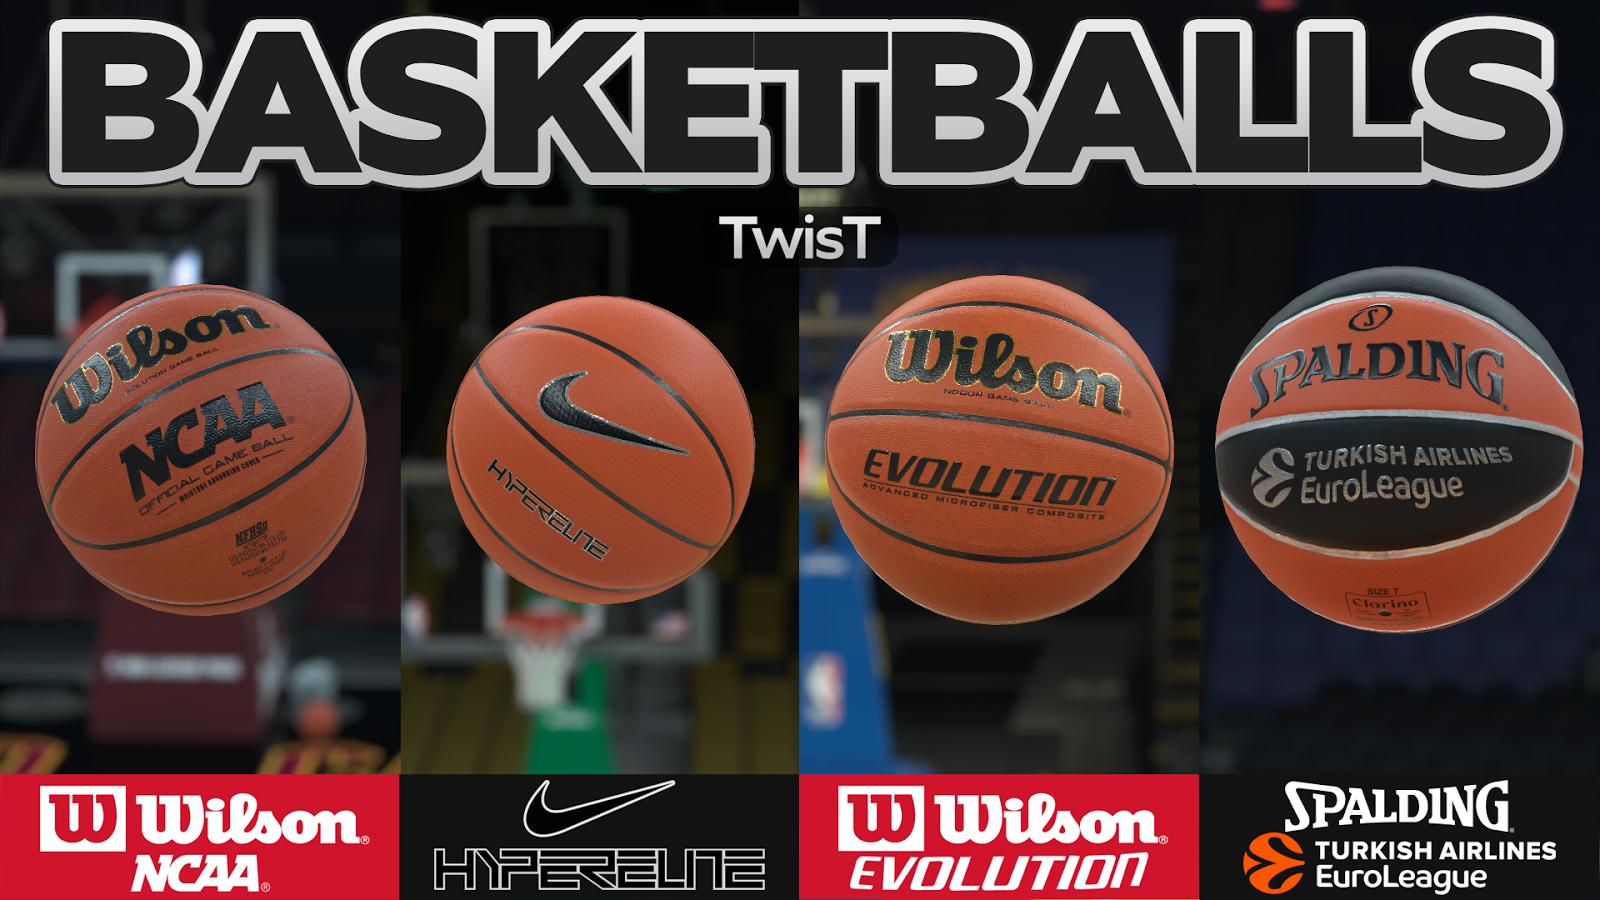 DNA Of Basketball | DNAOBB: NBA 2K18 Basketballs v2.1 by TwisT